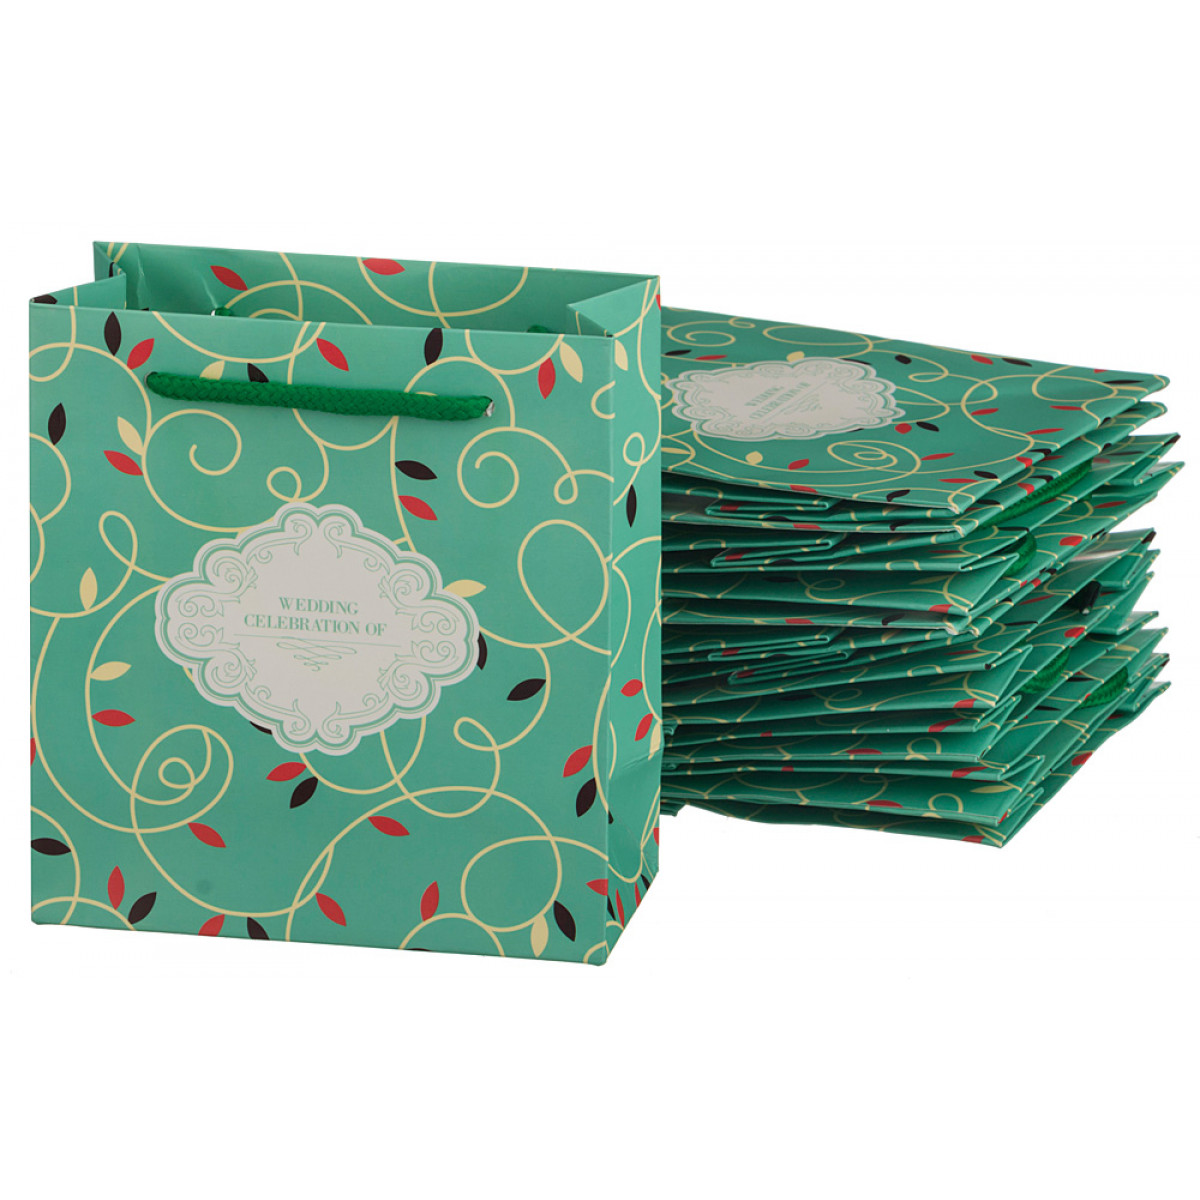 {} Lefard Пакет подарочный Jonty (7х14х16 см - 10 шт) lefard пакет подарочный luvinia 7х14х16 см 10 шт